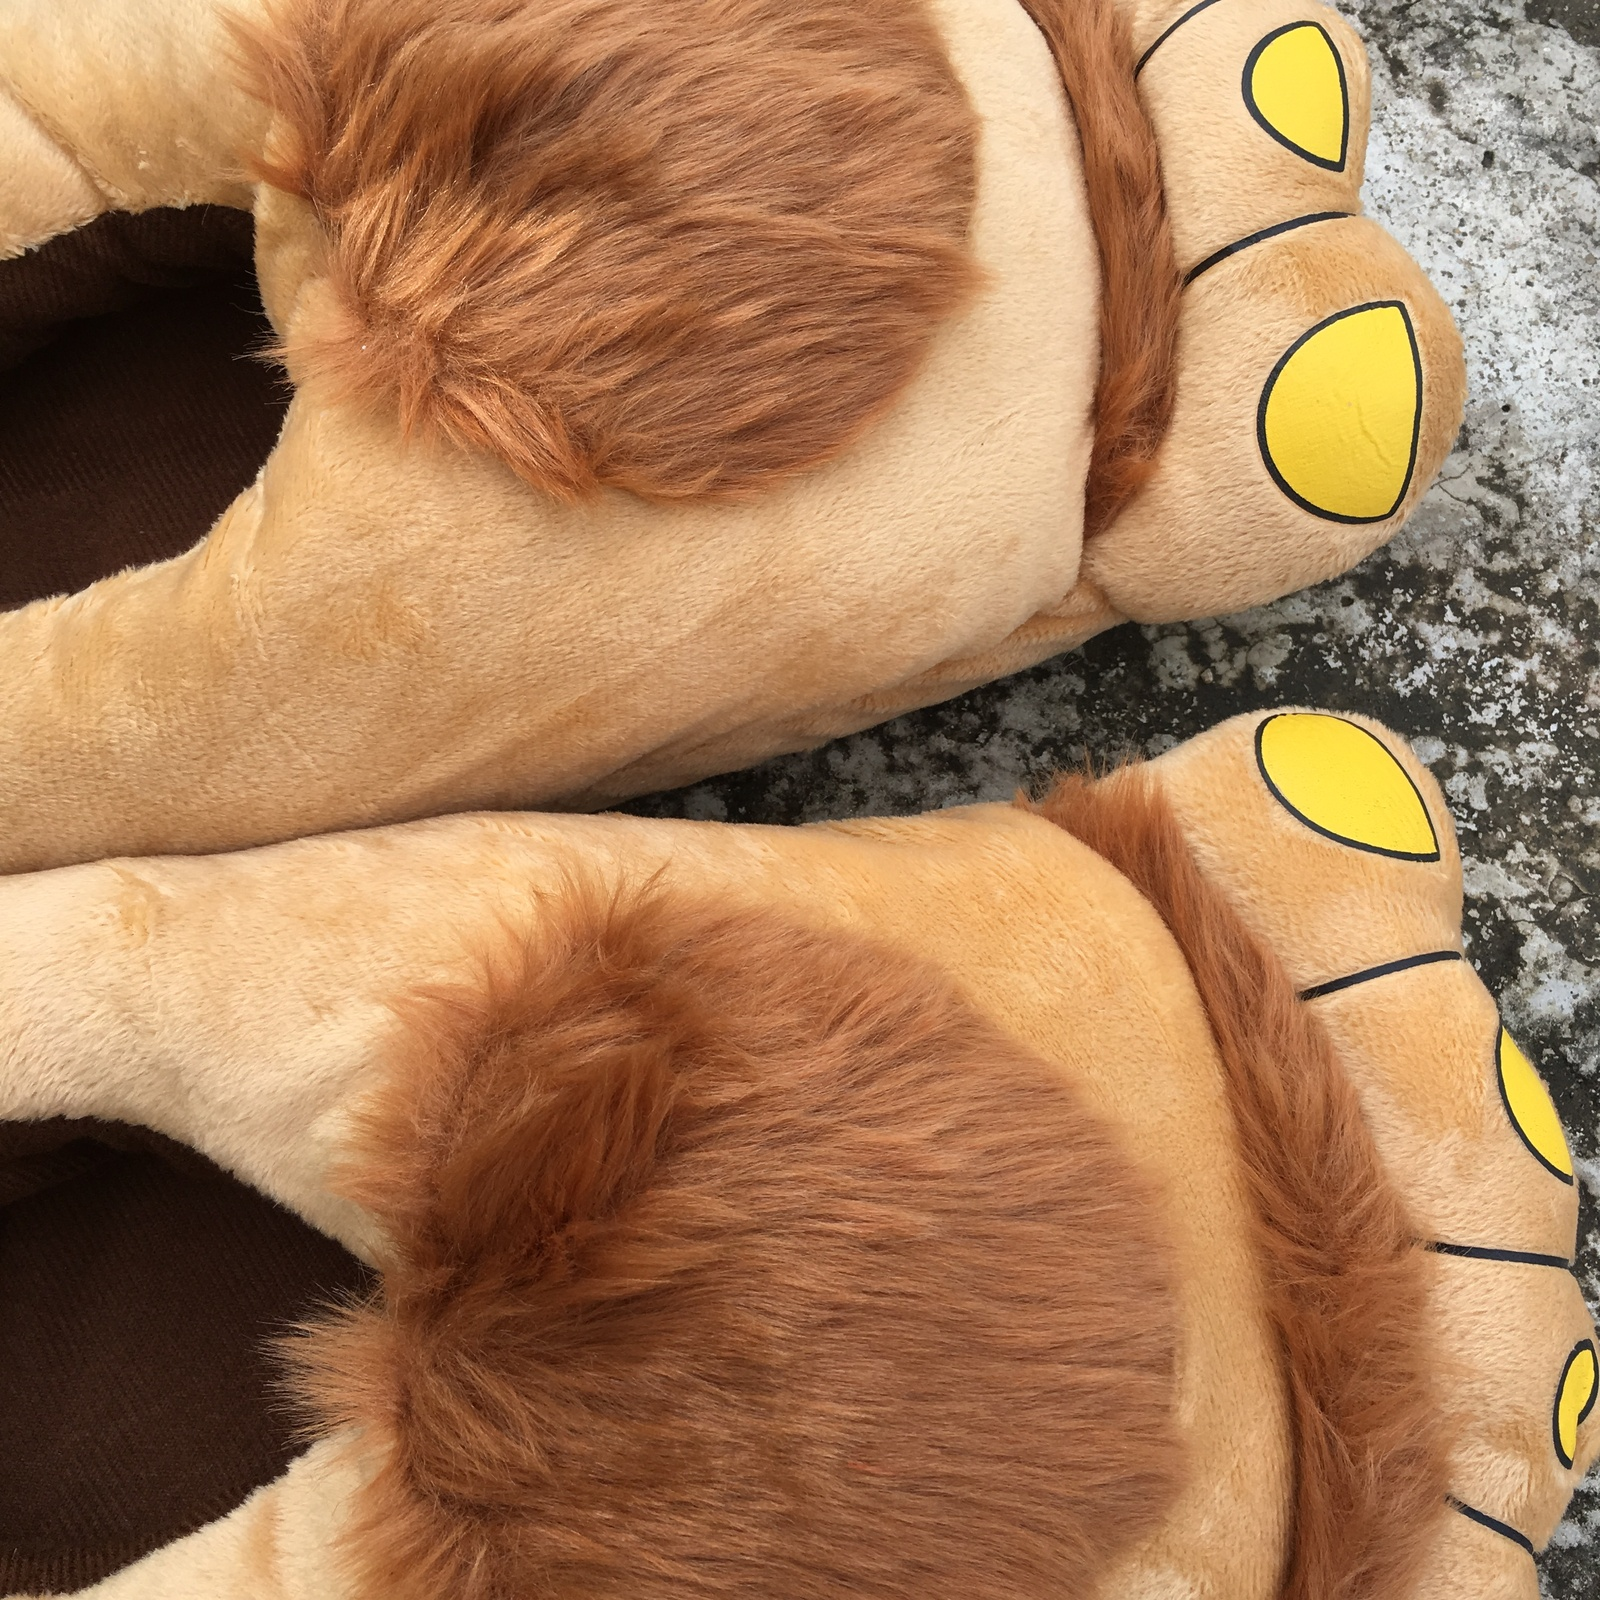 5f7fdf2c4fc55 Men Women Hairy Hobbit Feet Big Funny Poop Emoji Home Slippers Christmas  Gifts